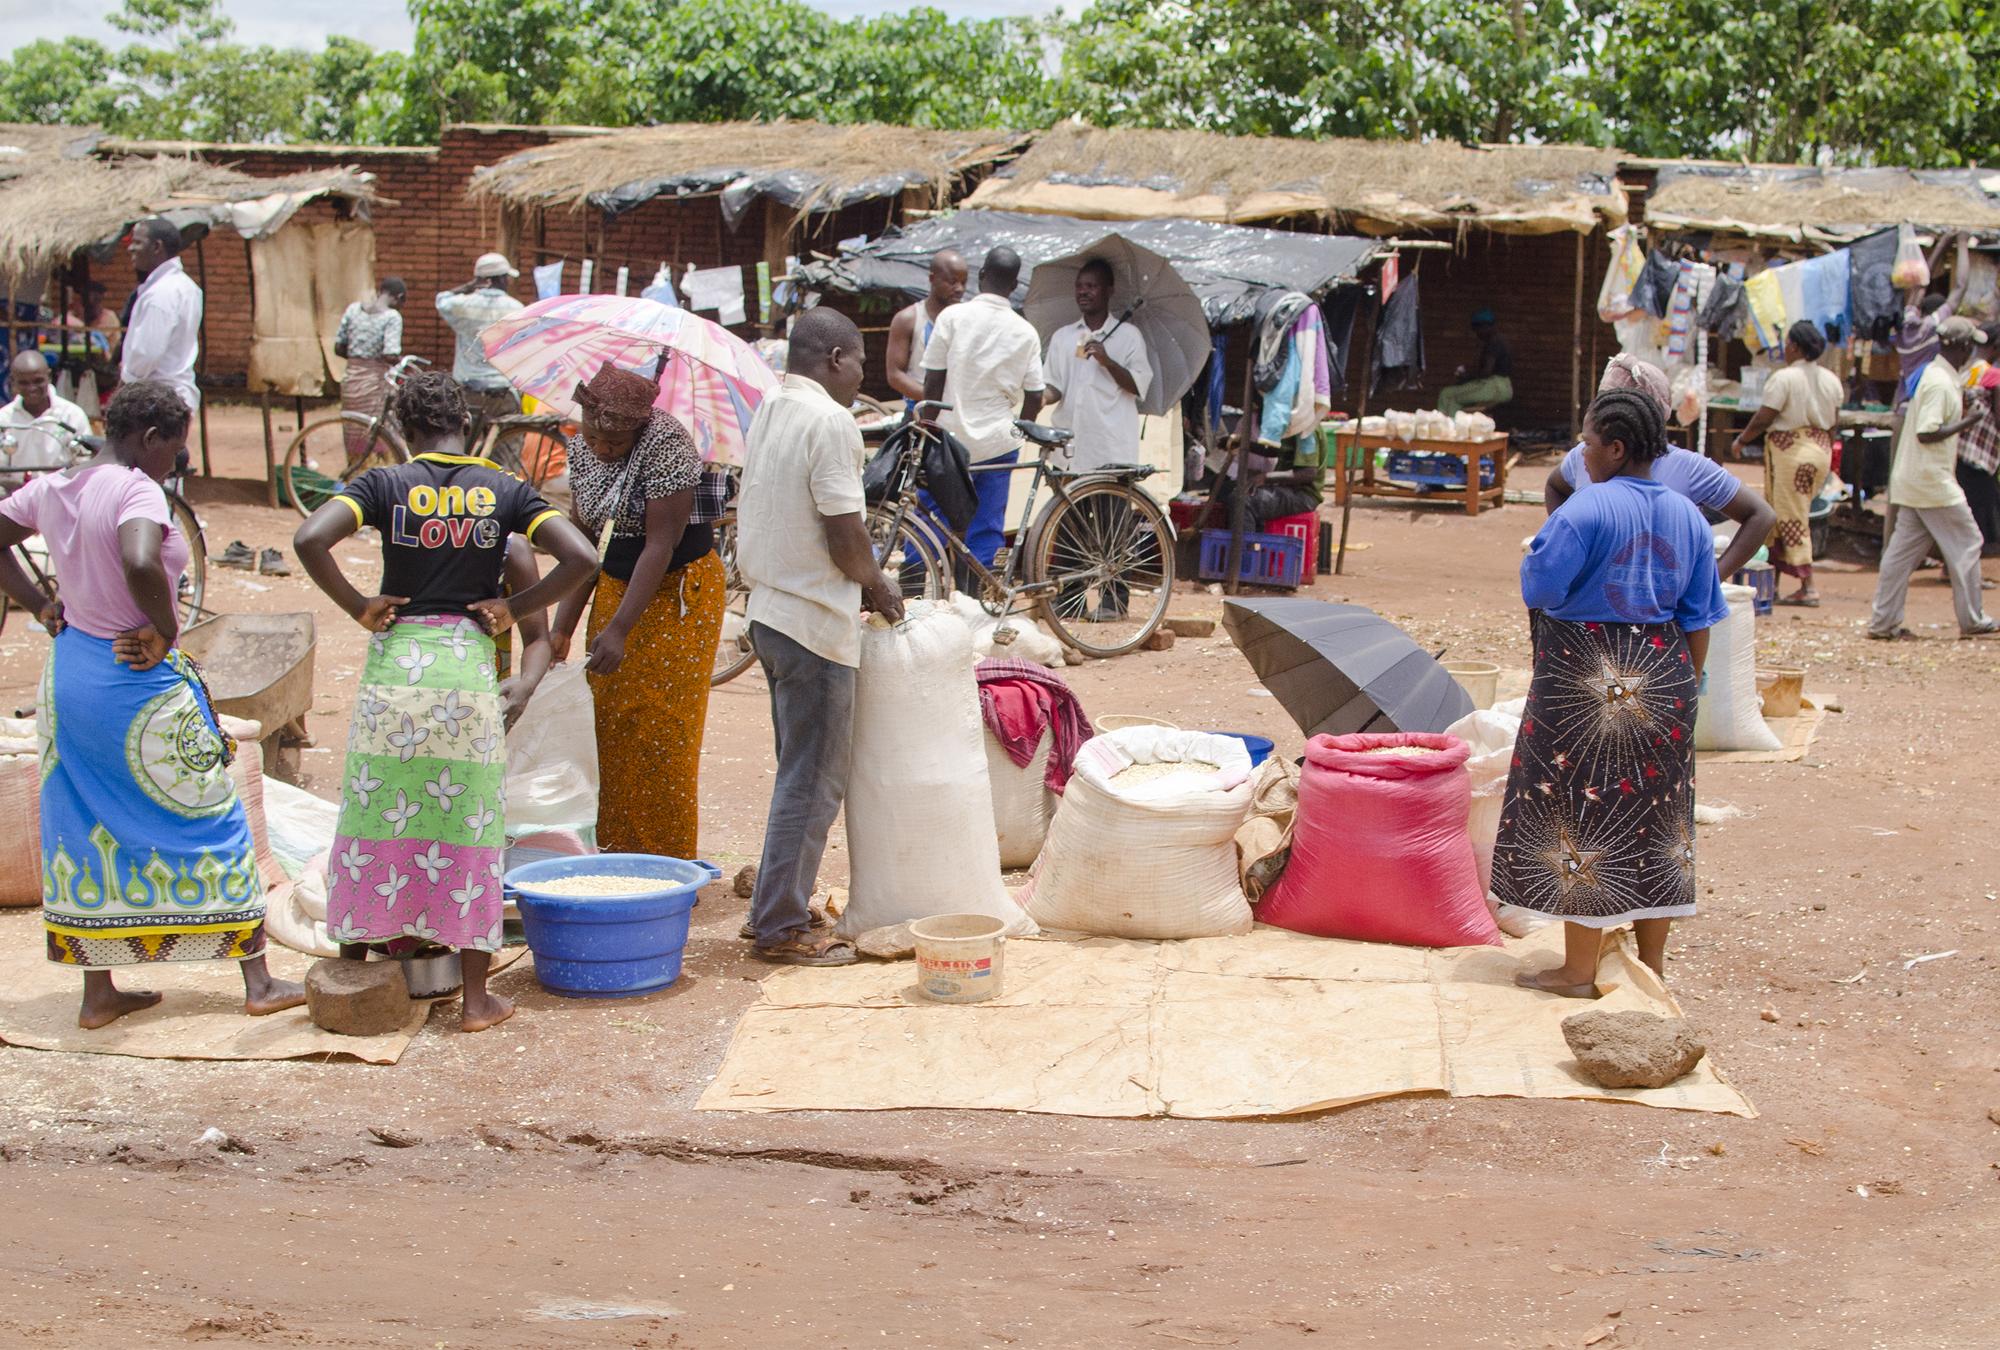 Food market in Malawi